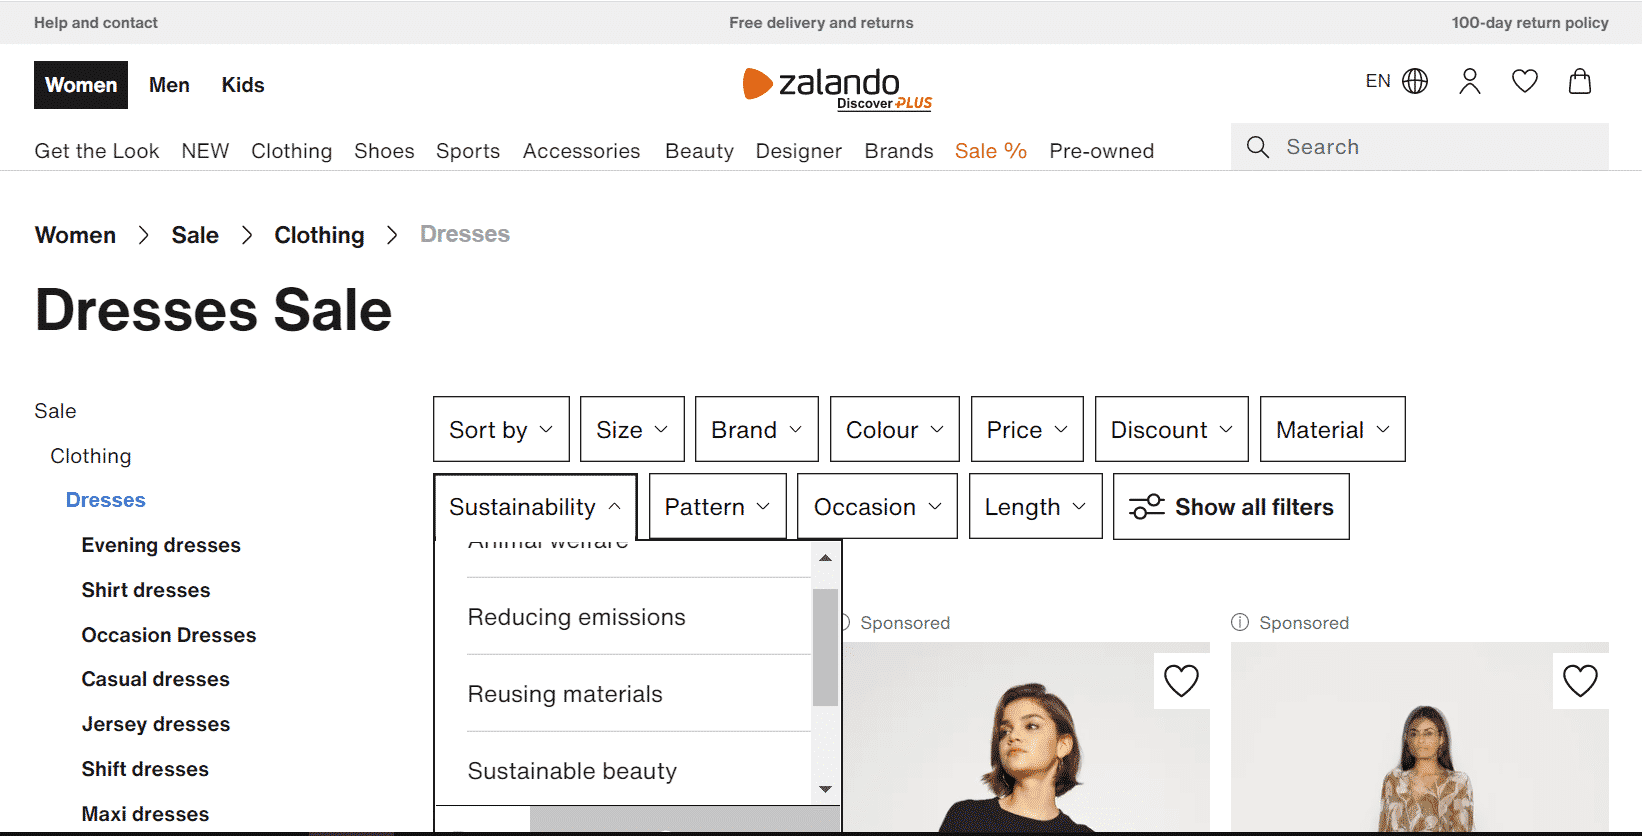 Zalando-fashion-ecommerce-revamping-in-phased-manner